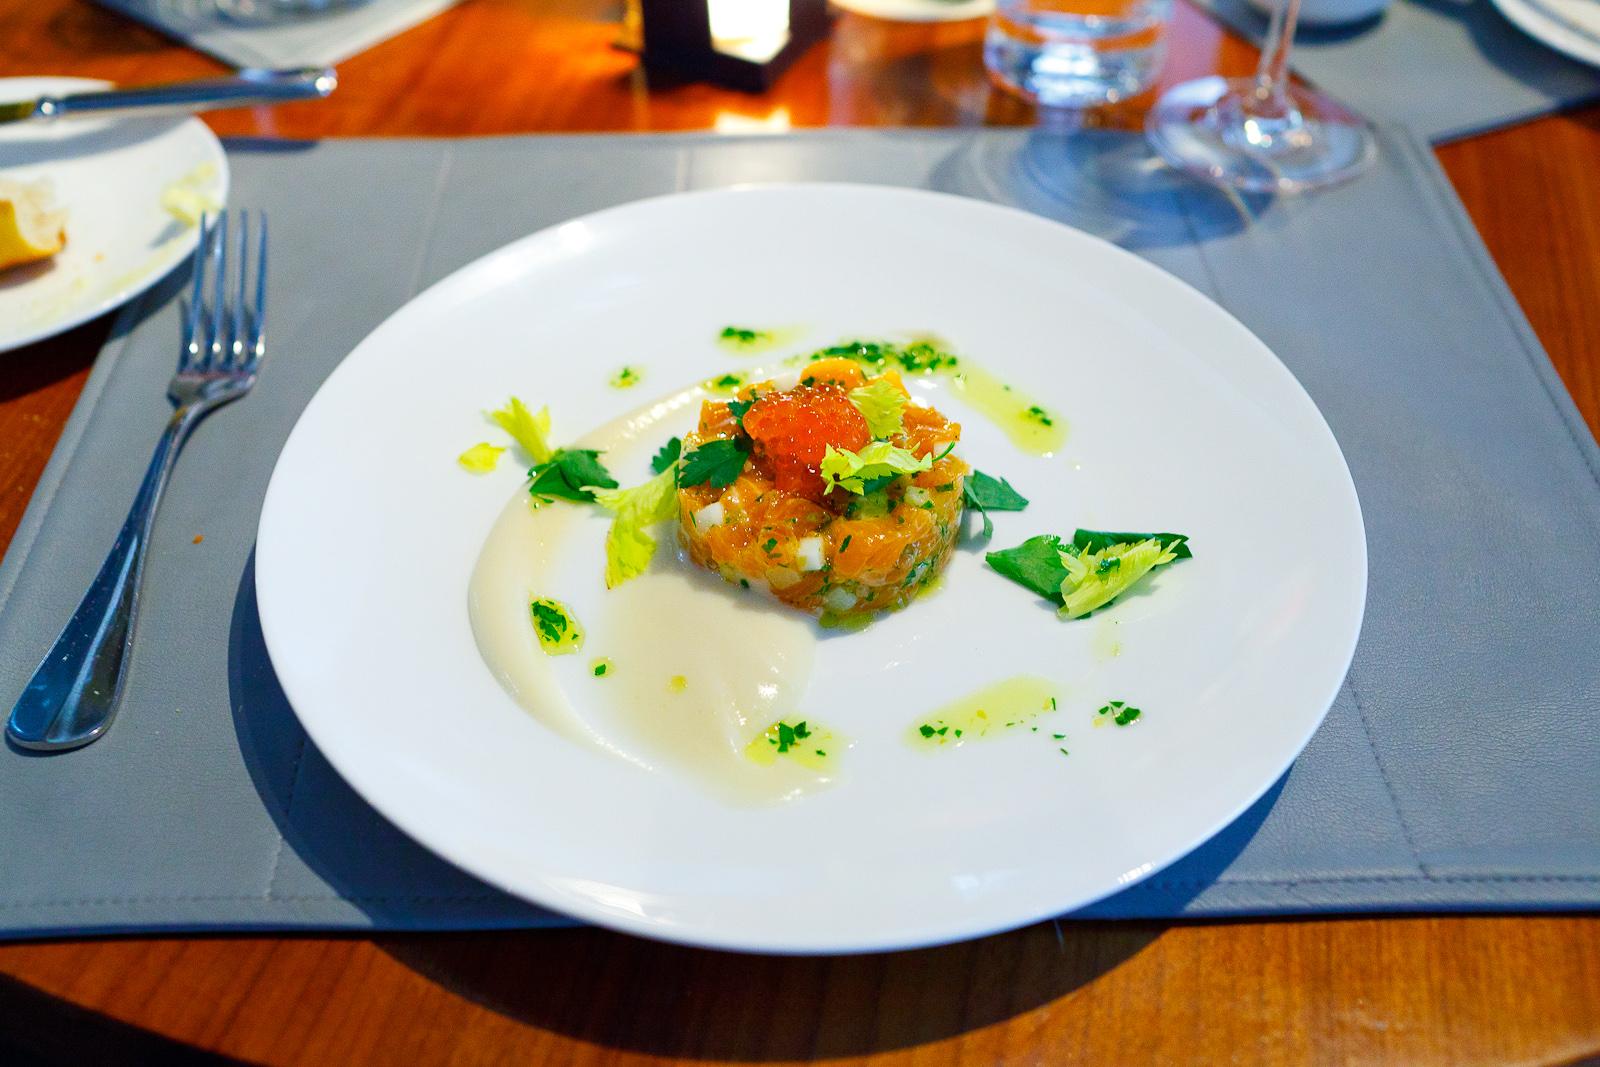 Salmon tartare, celery root, apple, lemon, parsley, salmon roe ($14)